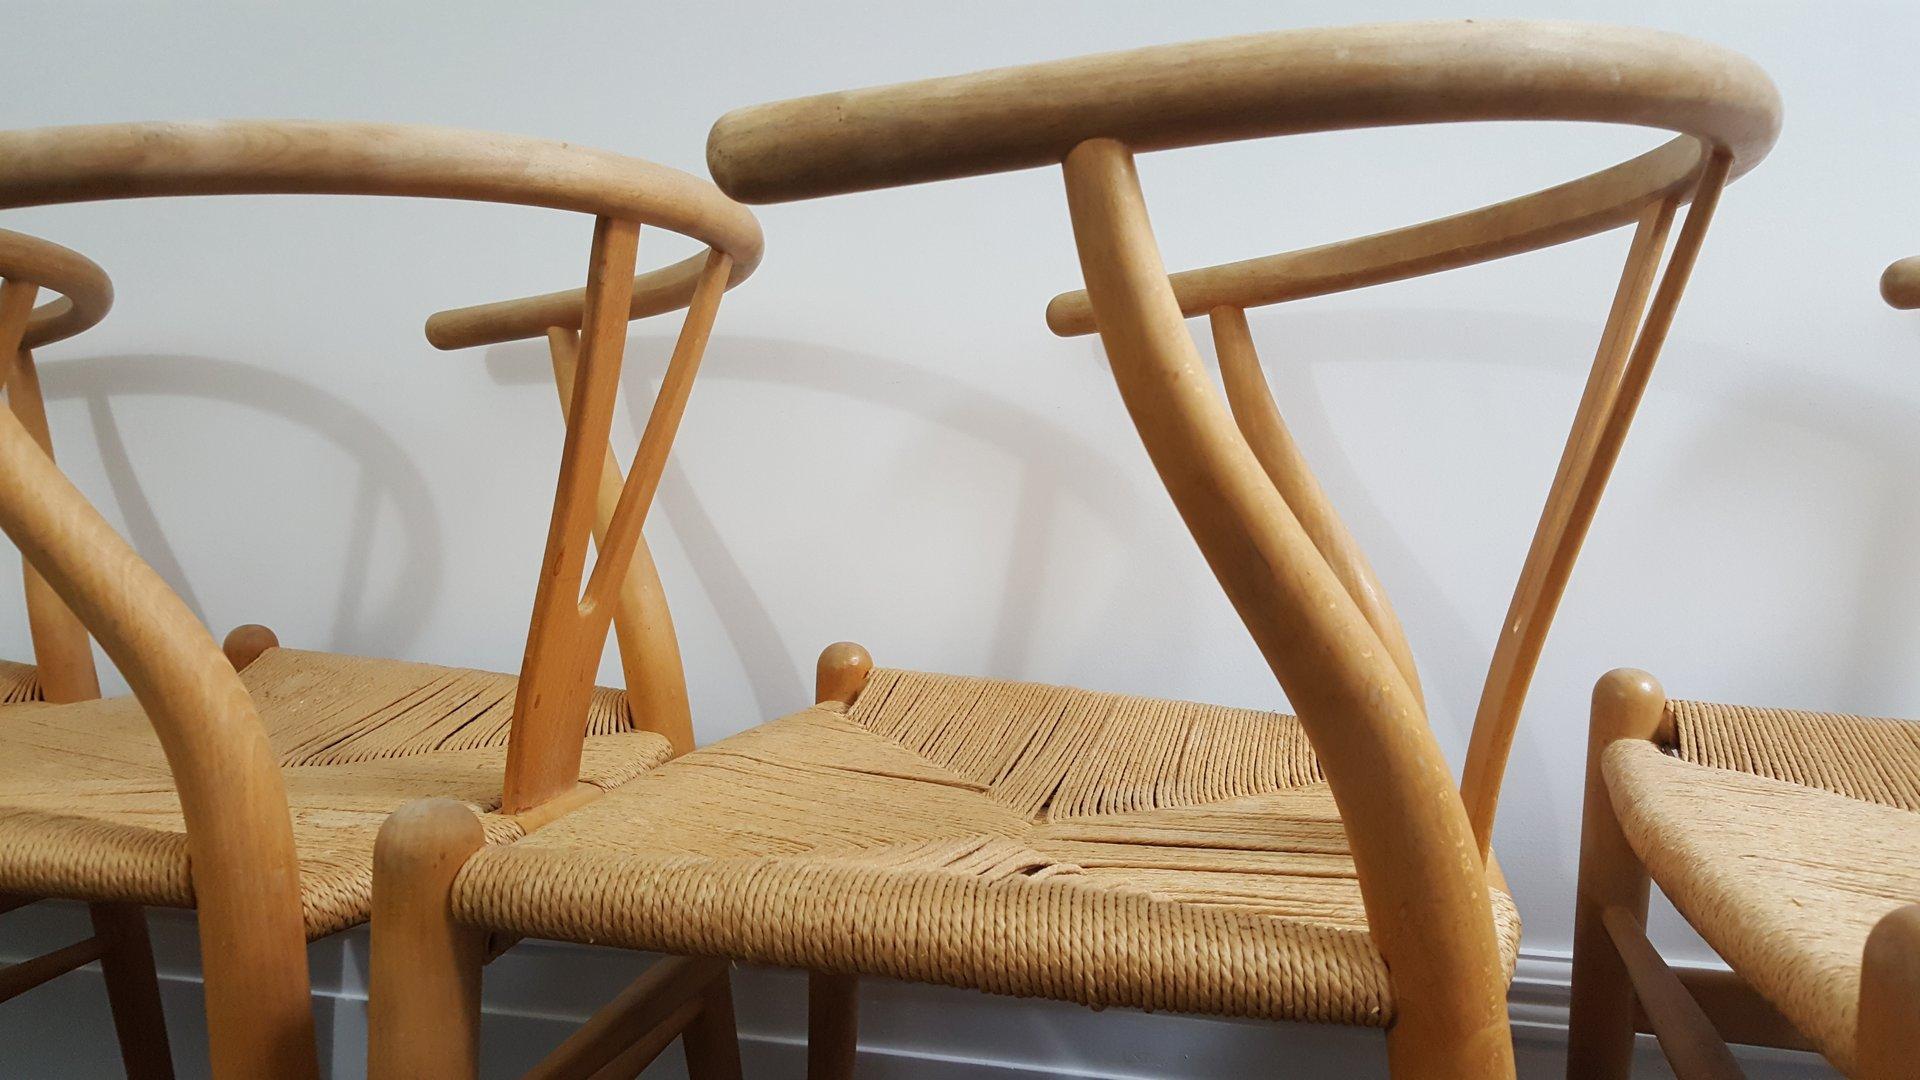 Mid Century Danish CH24 Wishbone Chairs by Hans J Wegner for Carl